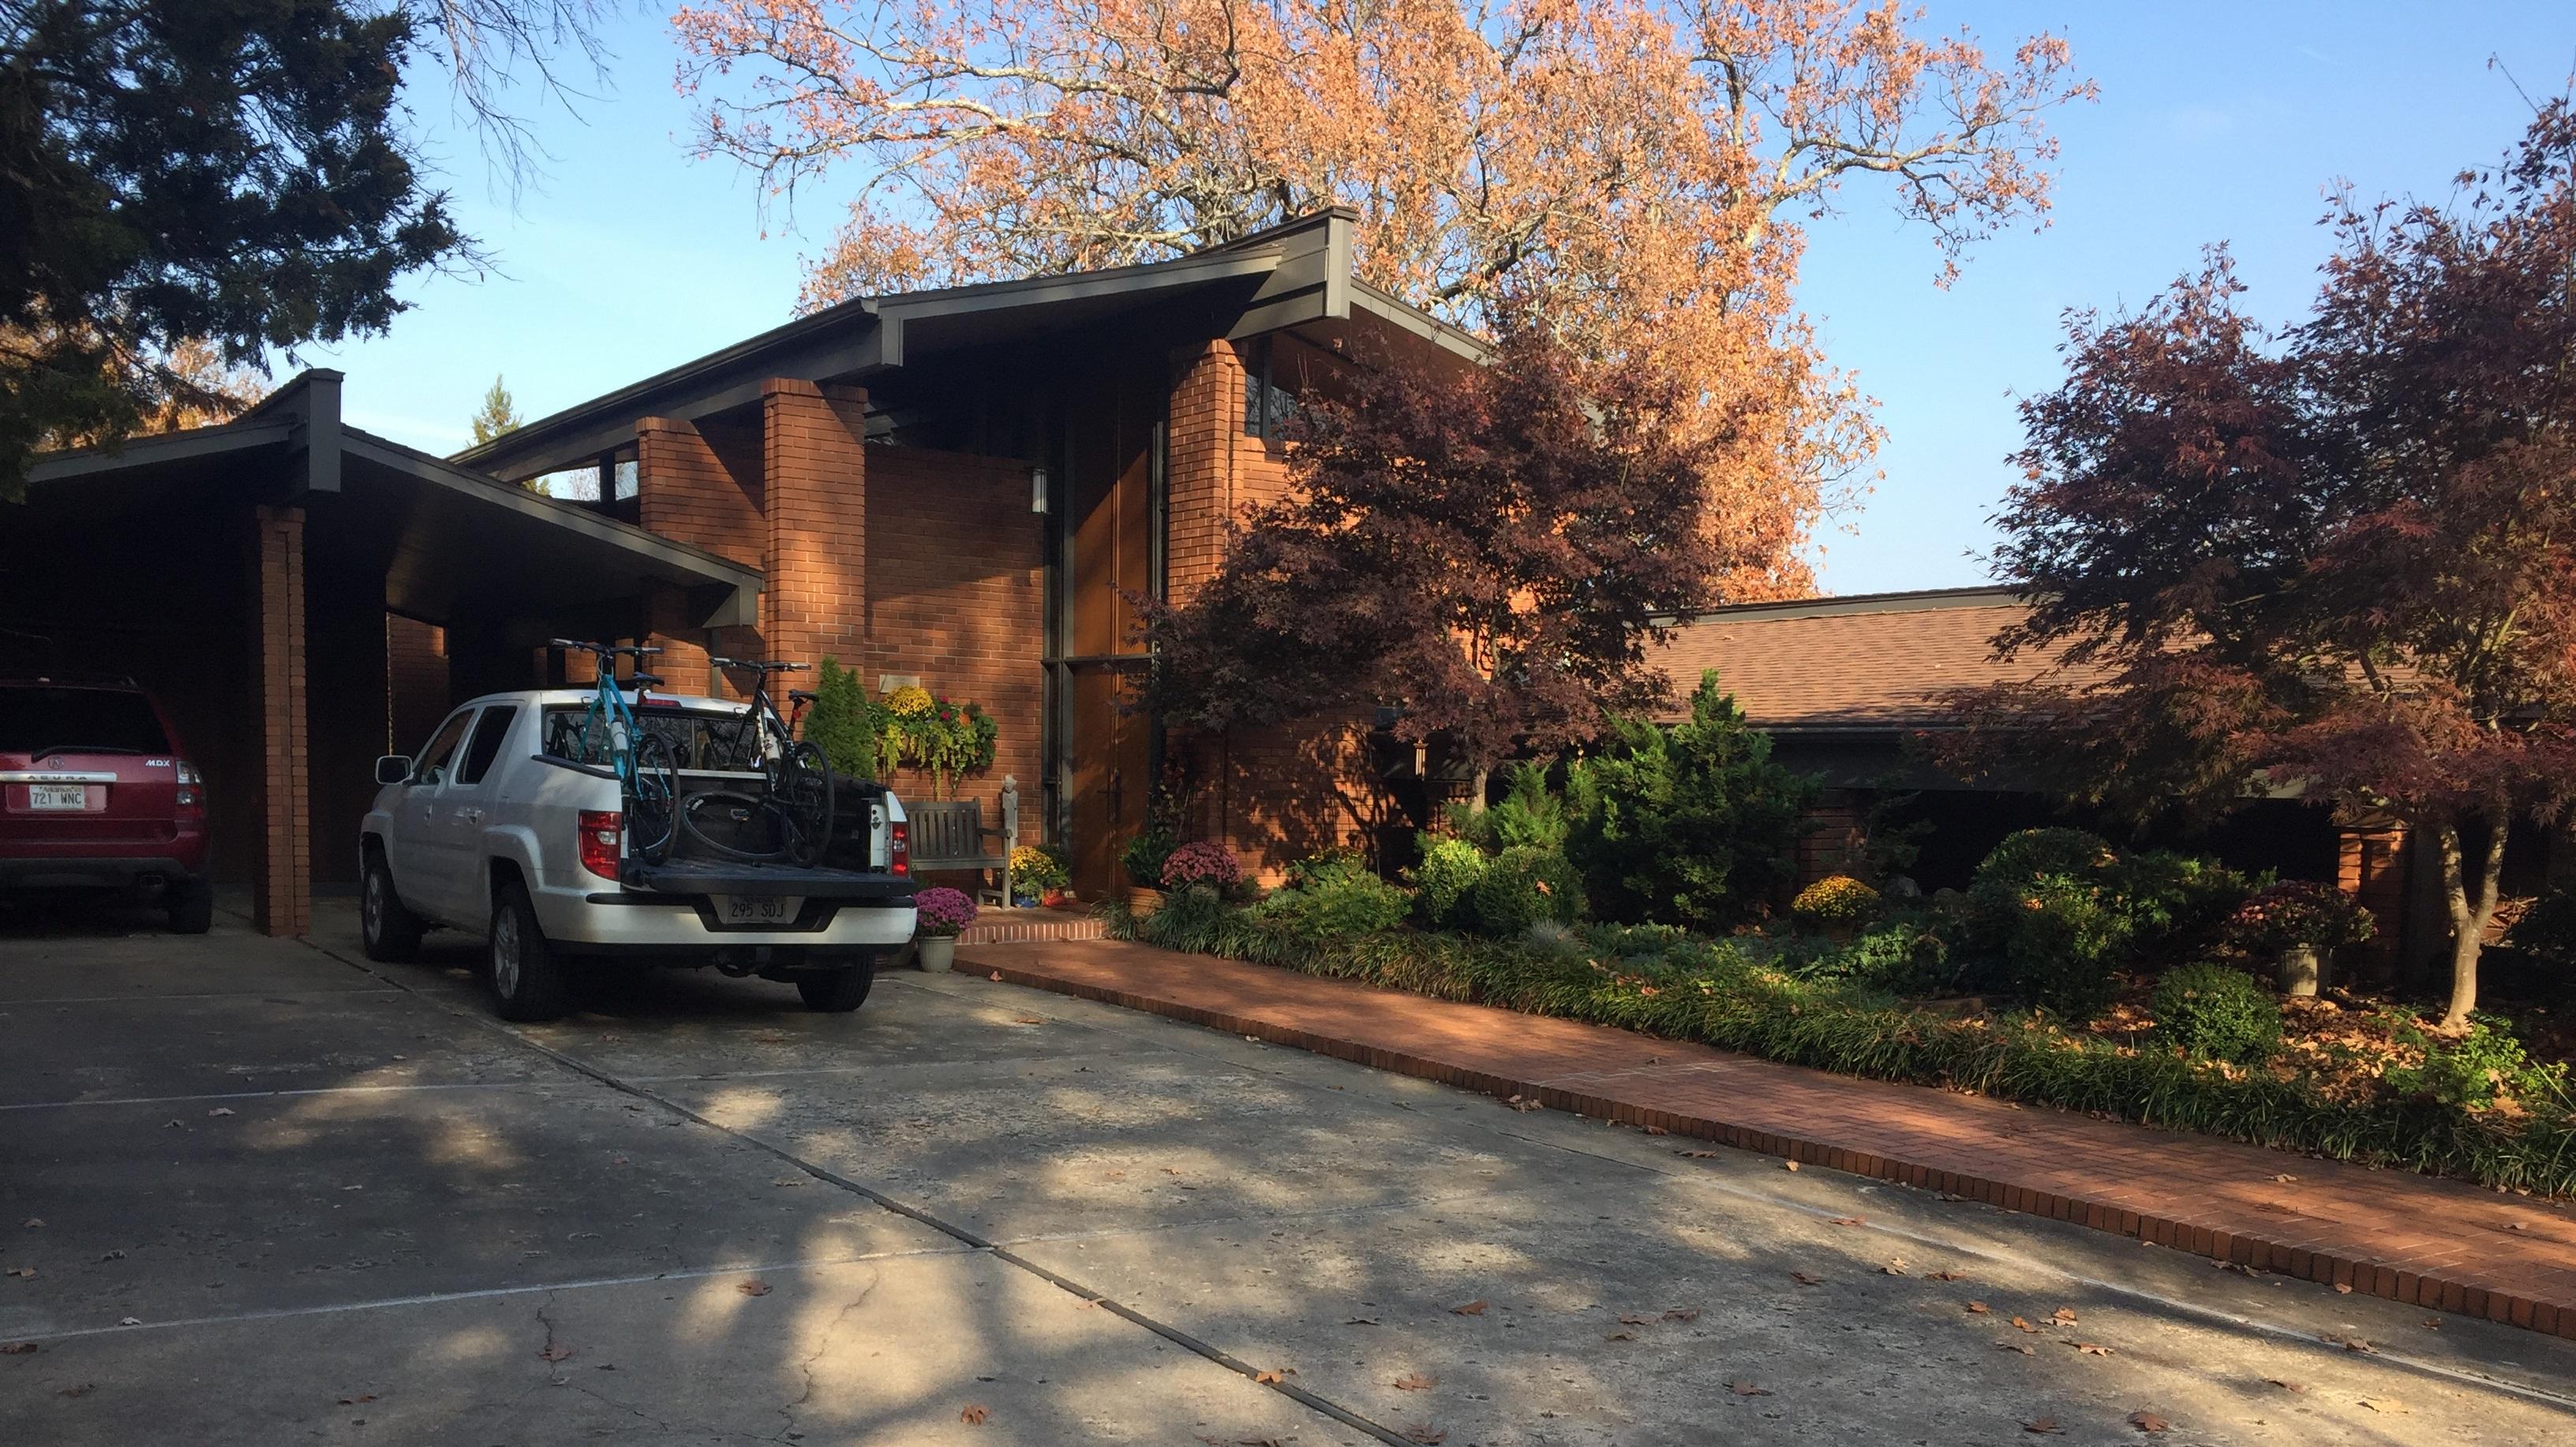 Home in Fayetteville designed by Ernie Jacks.